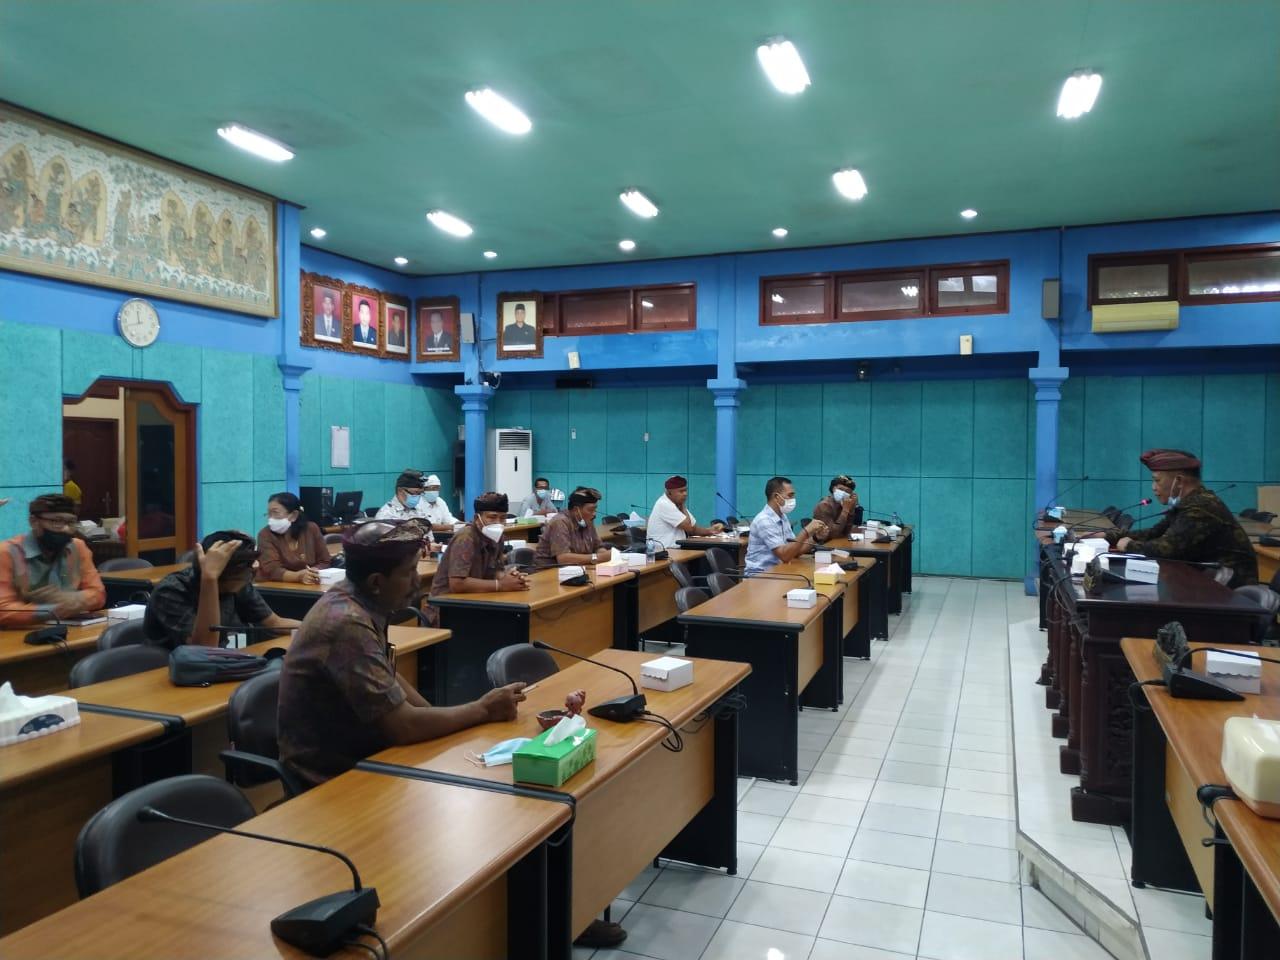 DPRD Klungkung melaksanakan rapat internal dipimpin Ketua DPRD, Anak Agung Gde Anom, Kamis (12/8/2021). Foto: ist